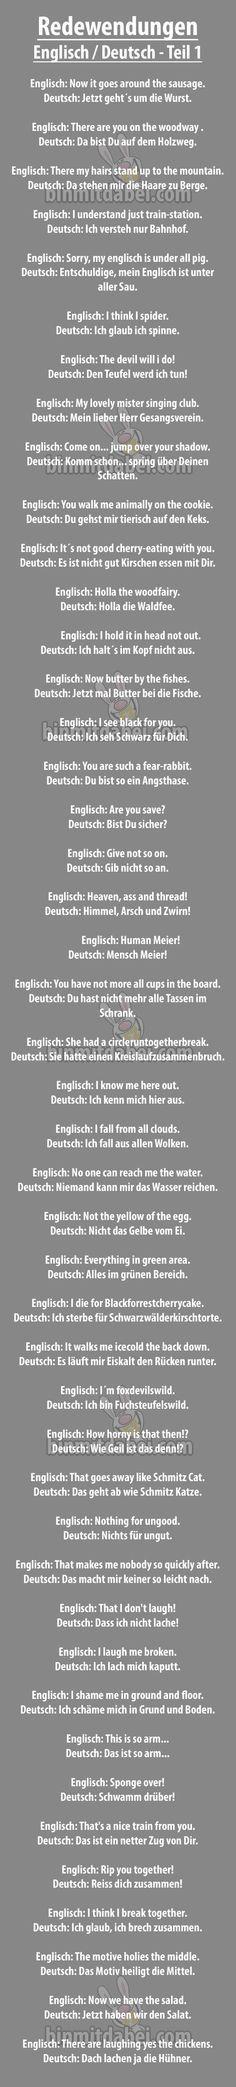 Übersetzungsbüro Arabisch deutsch München - http://www.profi-fachuebersetzung.de/uebersetzungsbueros/muenchen.html